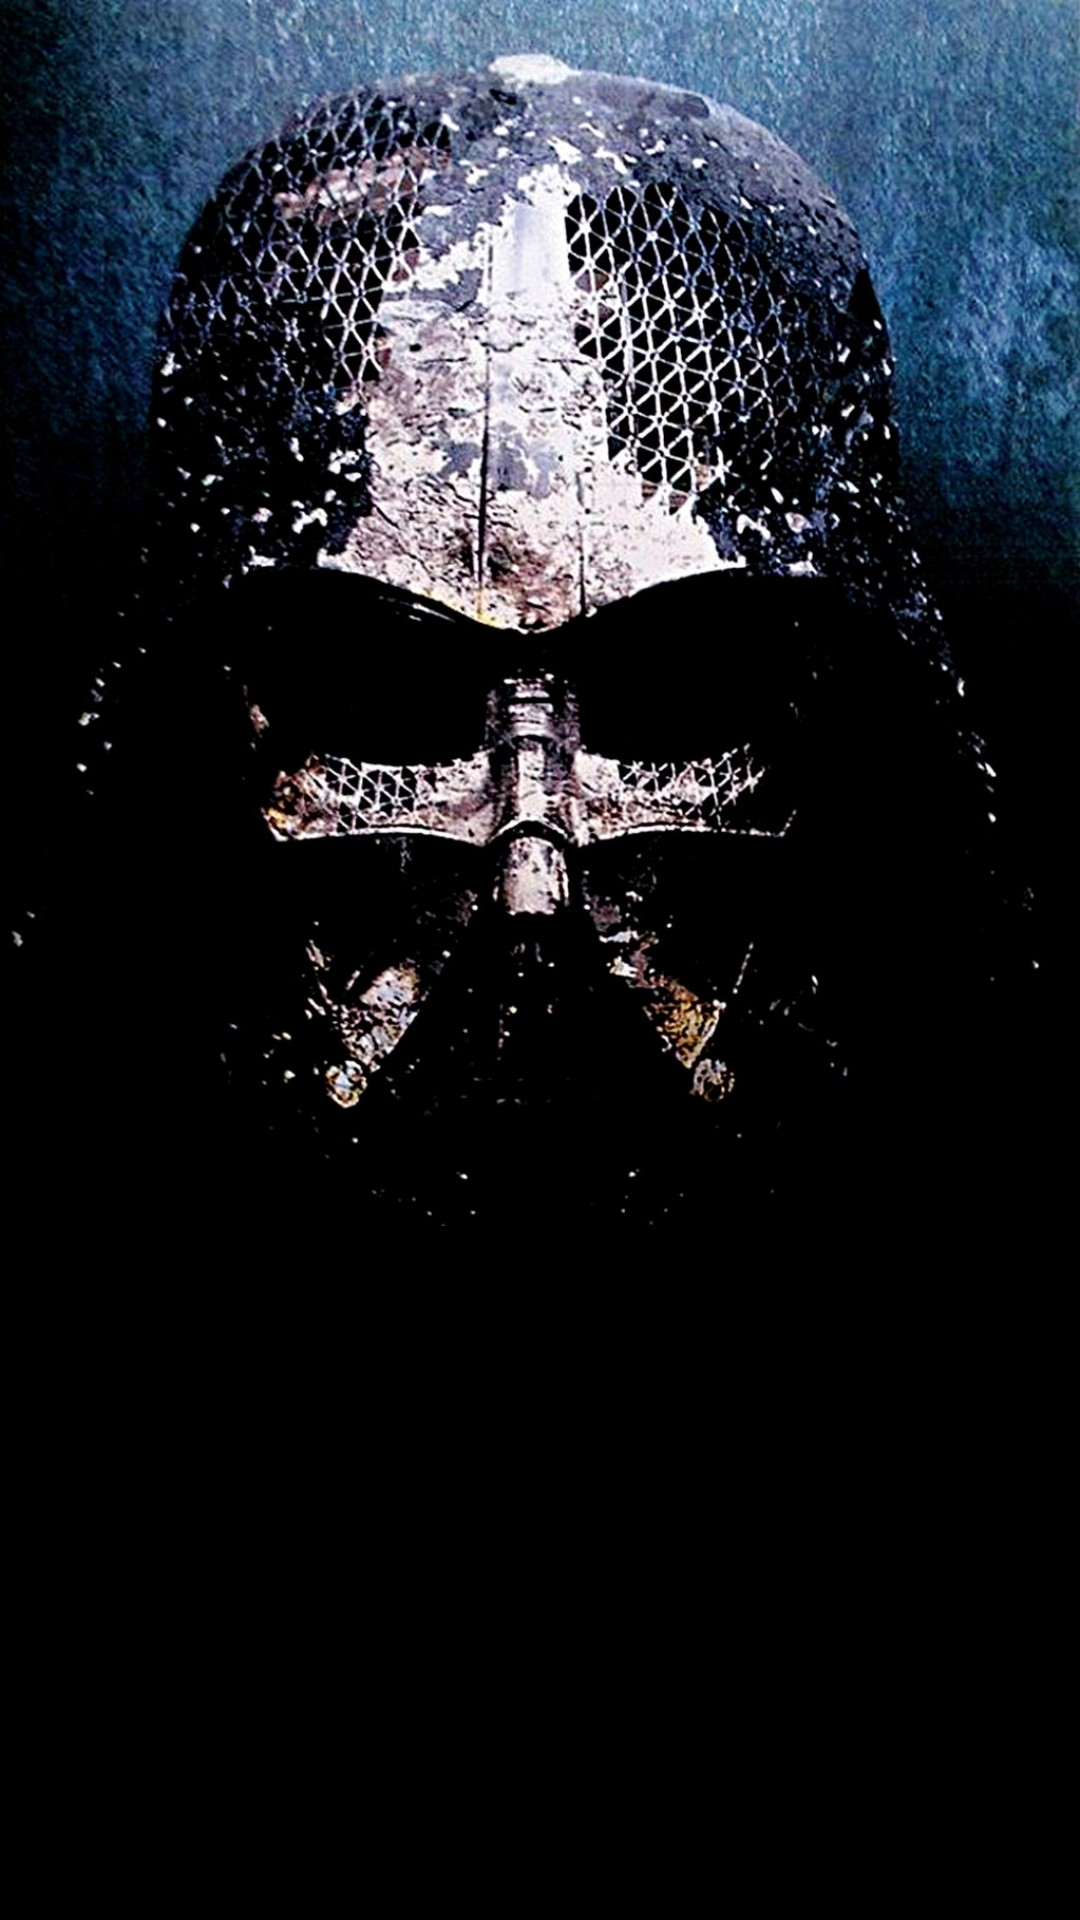 1920x1200 ... kylo_ren_star_wars_the_force_awakens Kylo-Ken-wallpaper Kylo-Ren STAR_WARS_FORCE_AWAKENS star_wars_the_force_awakens_kylo_ren .